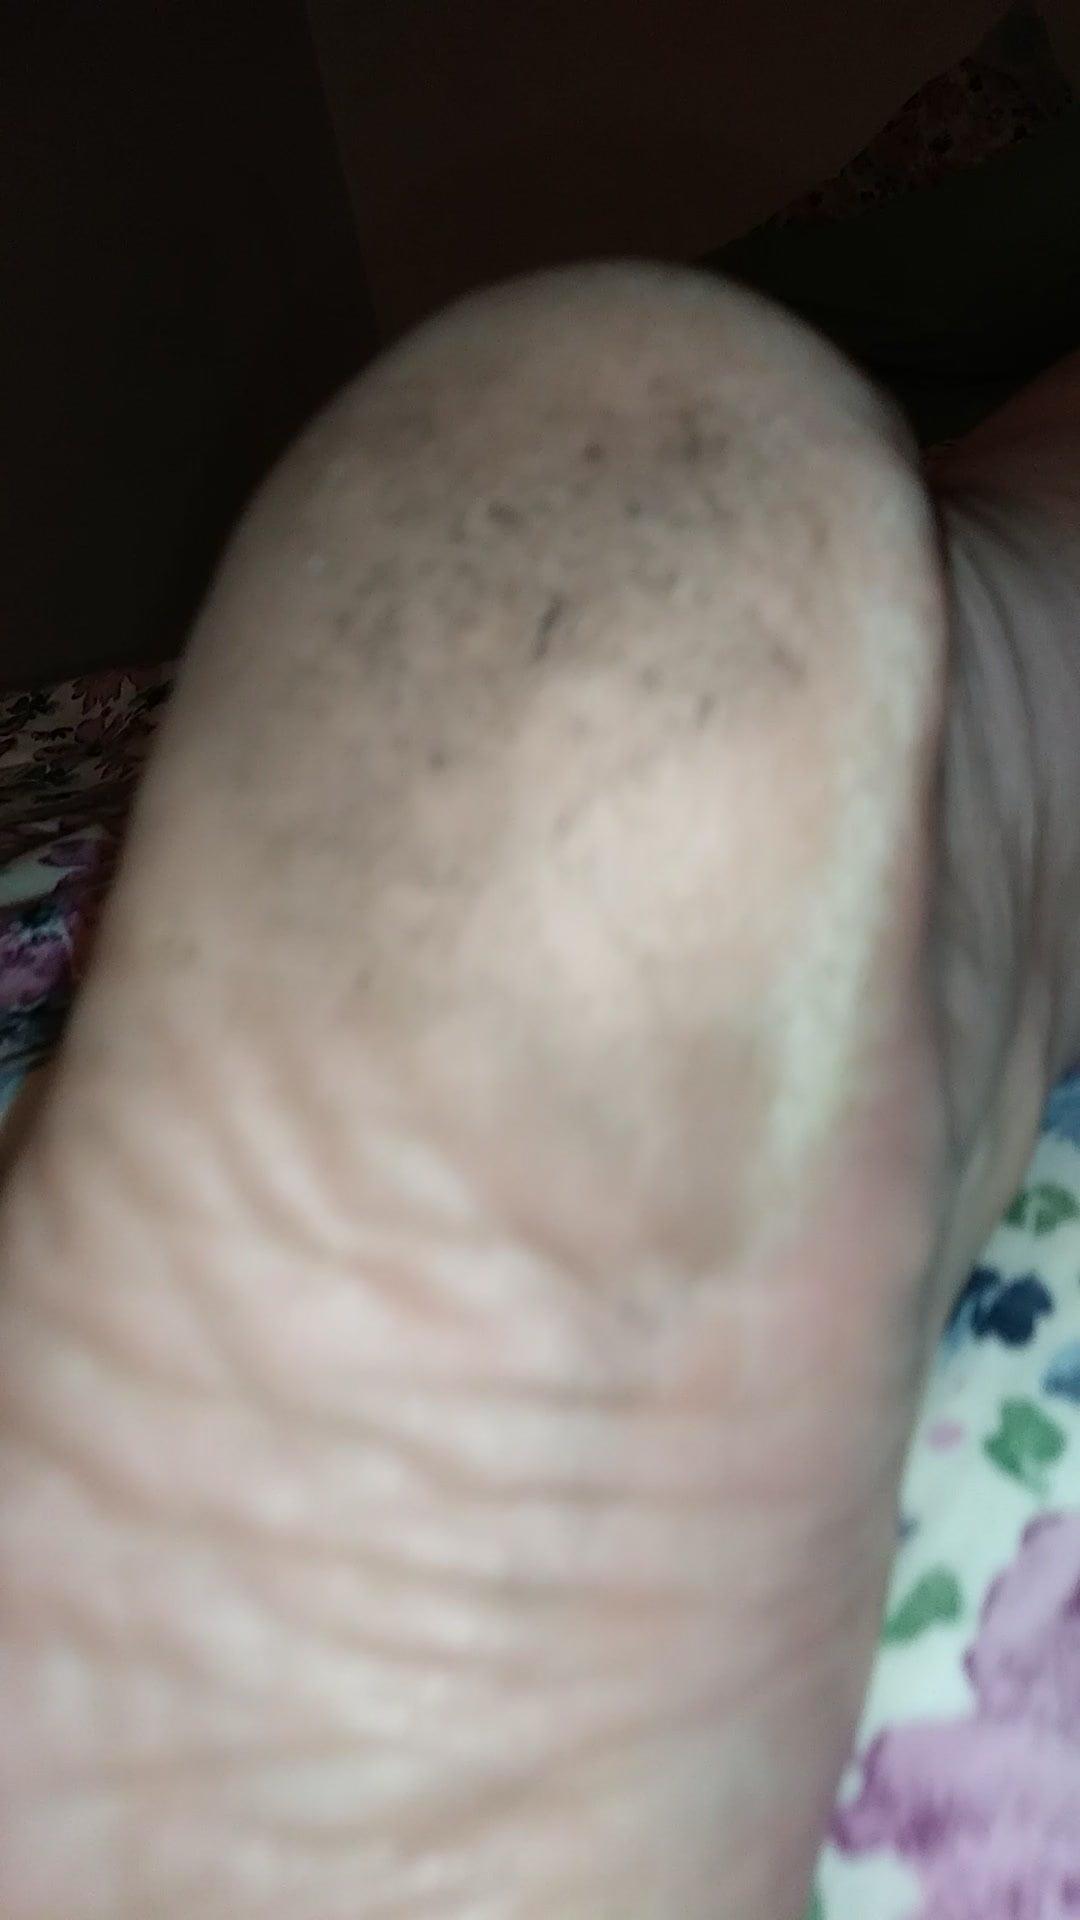 Spouse soiled soles